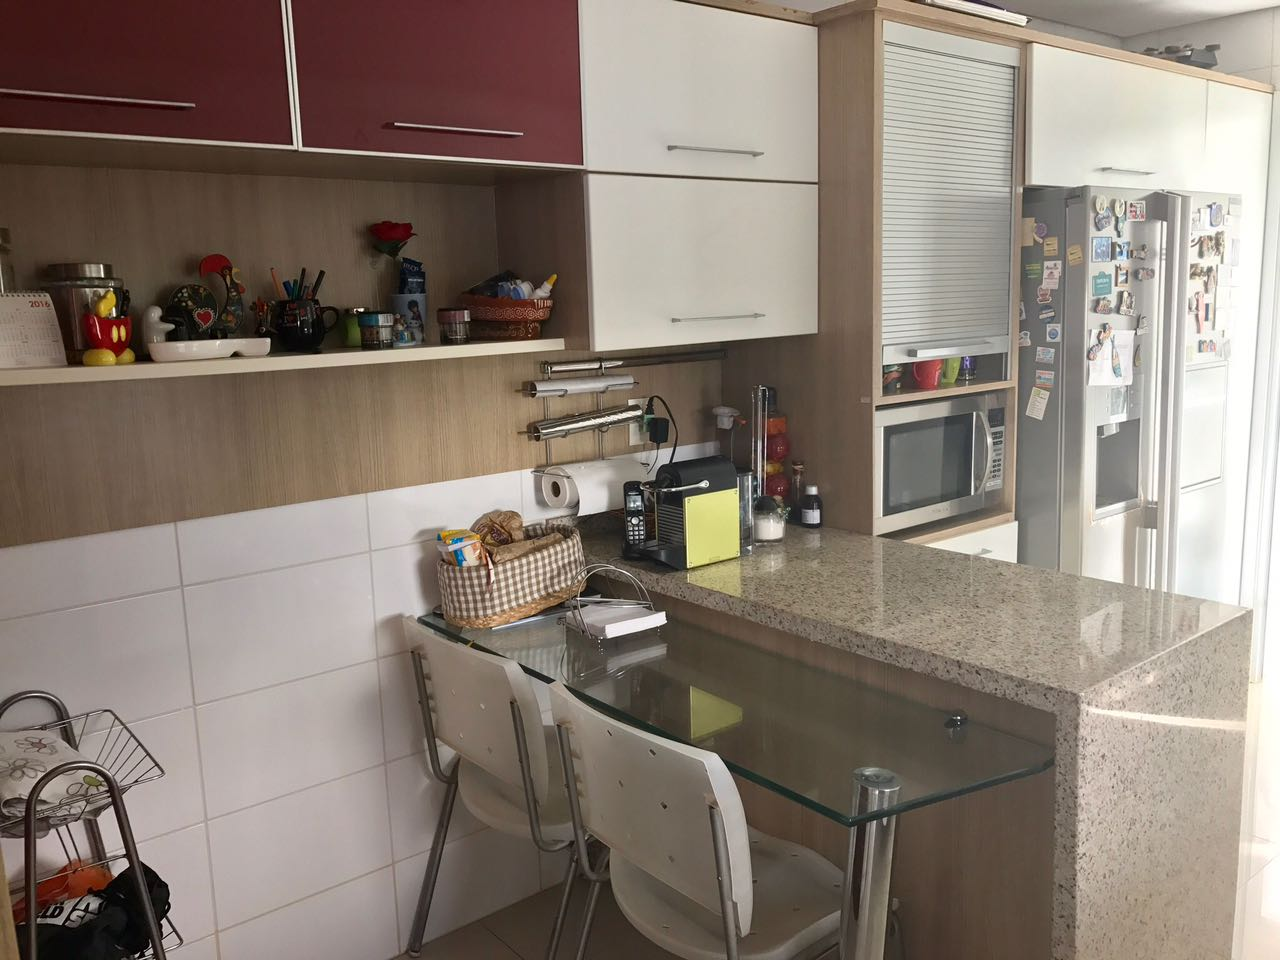 Casa Cond. Fechado  com 3 quartos sendo 3 Suítes no JARDIM ITALIA, Cuiabá  - MT